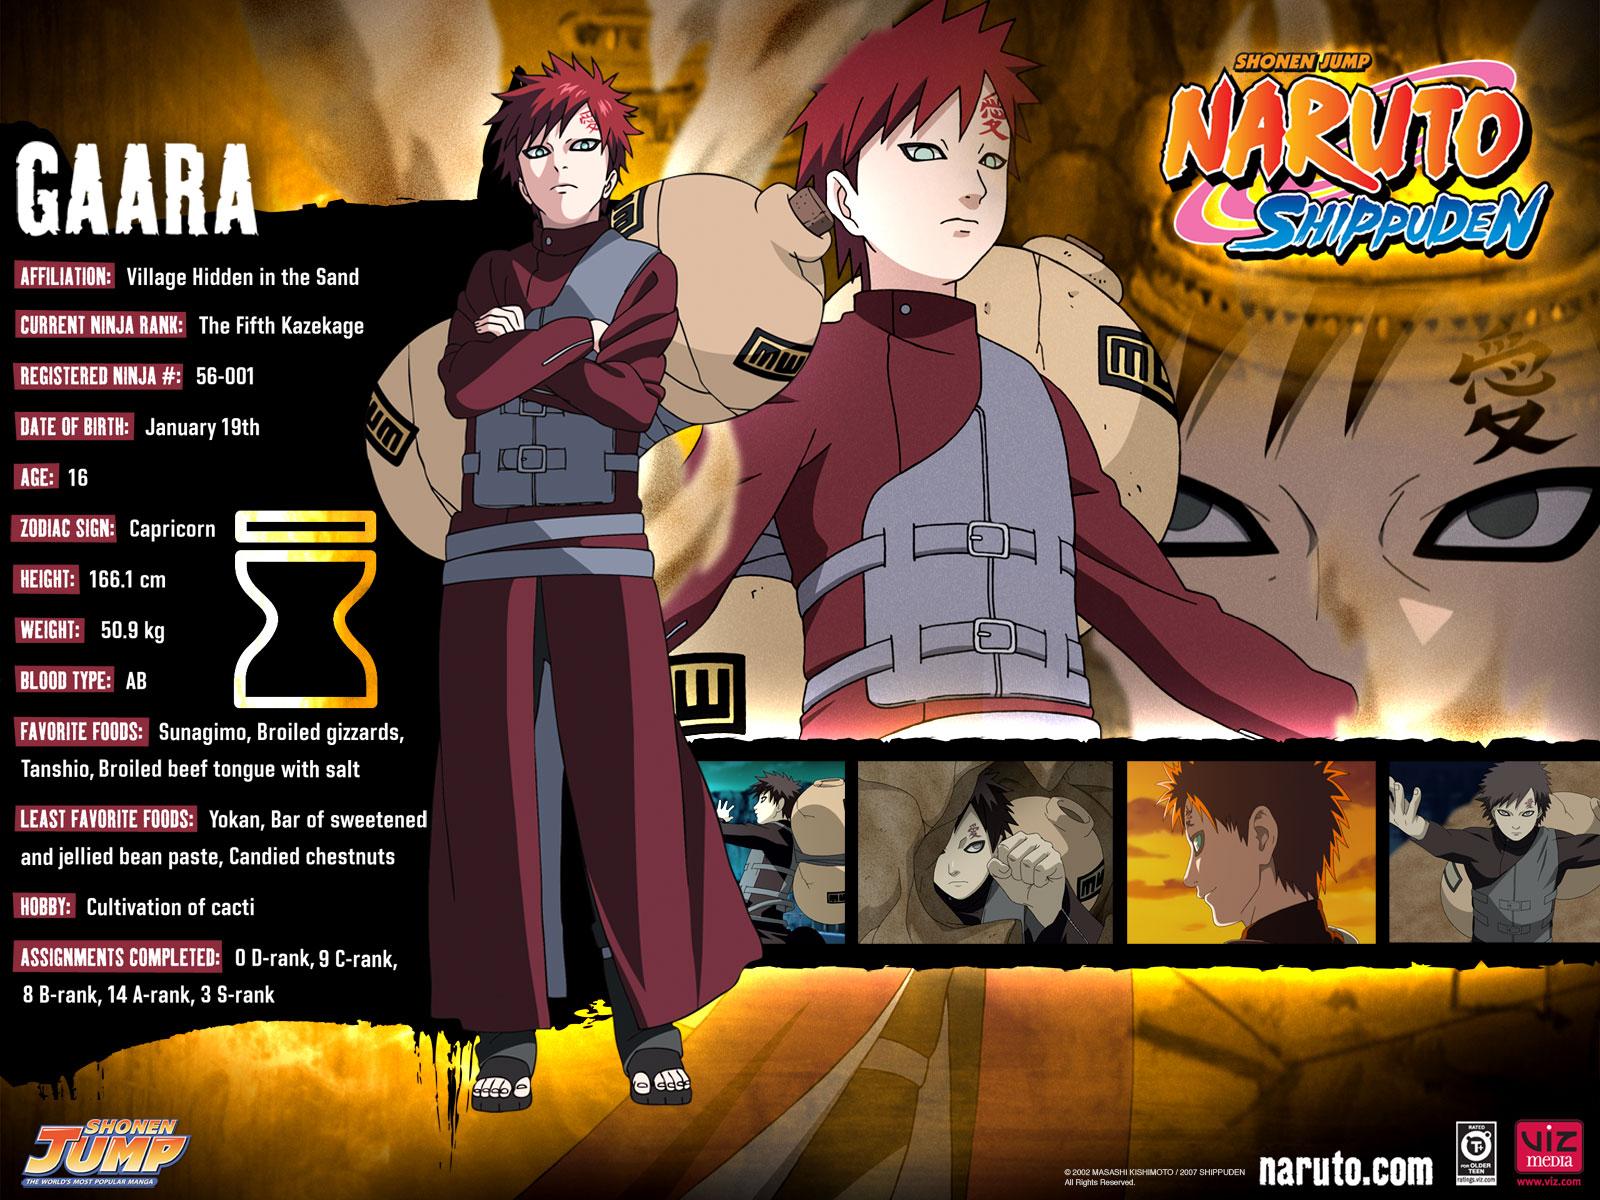 Gaara Naruto Shippuden Wallpaper Naruto Wallpaper For Desktop 1600x1200